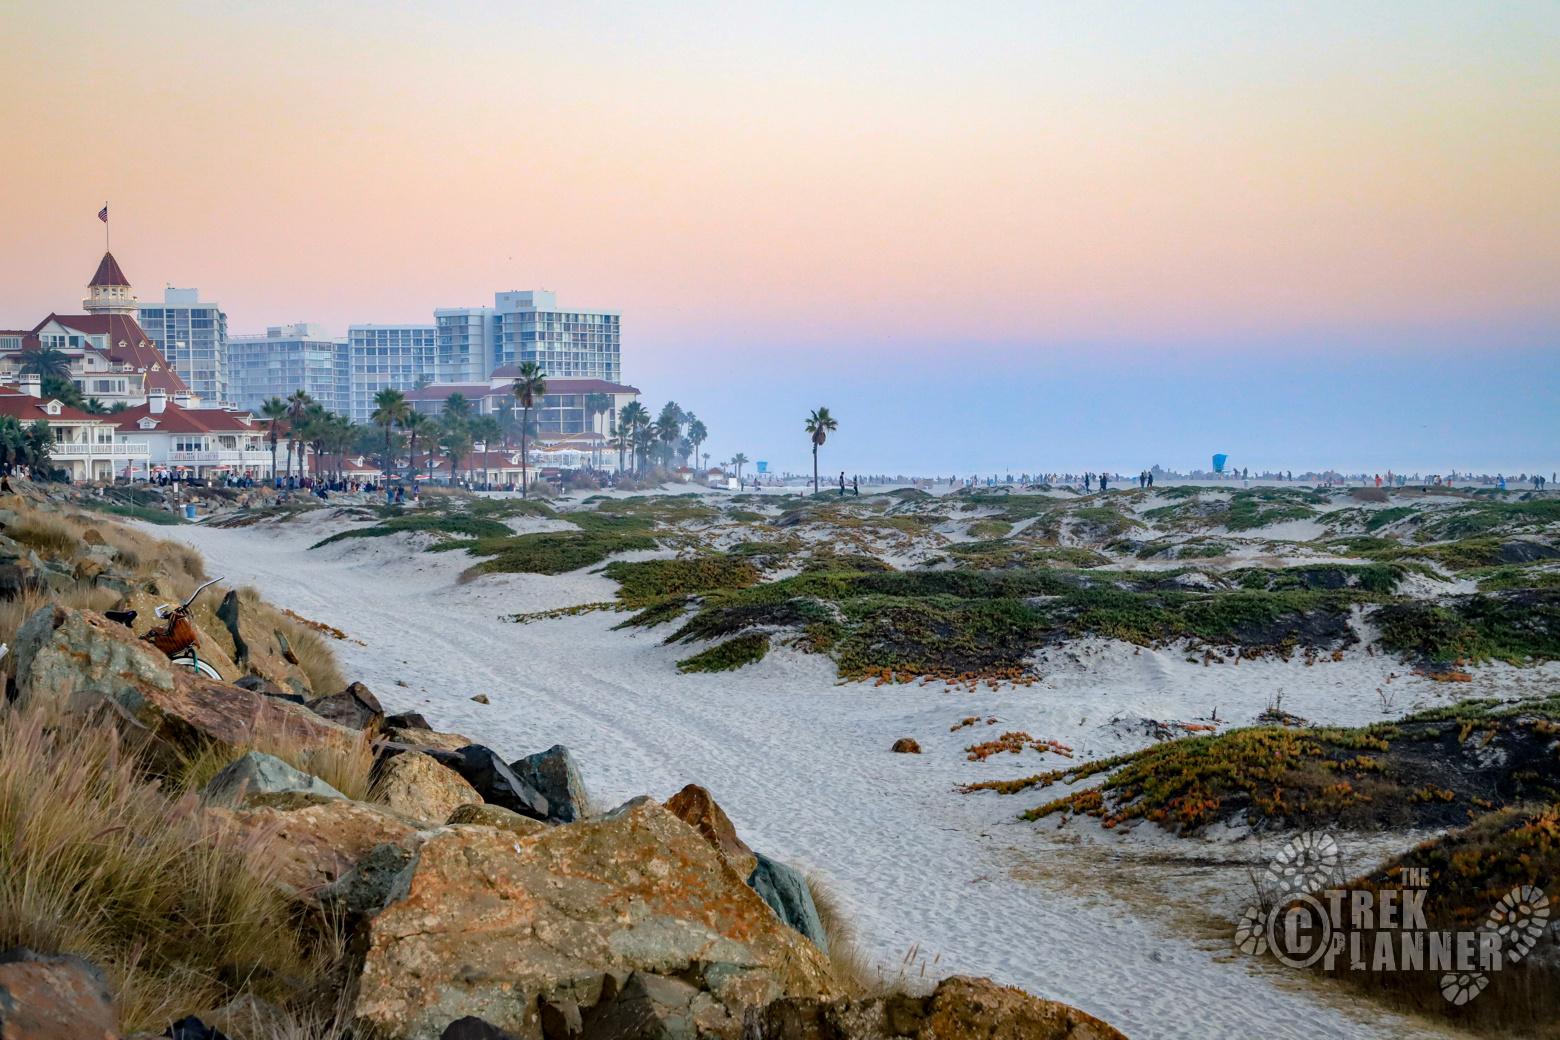 Coronado Beach  San Diego California  The Trek Planner